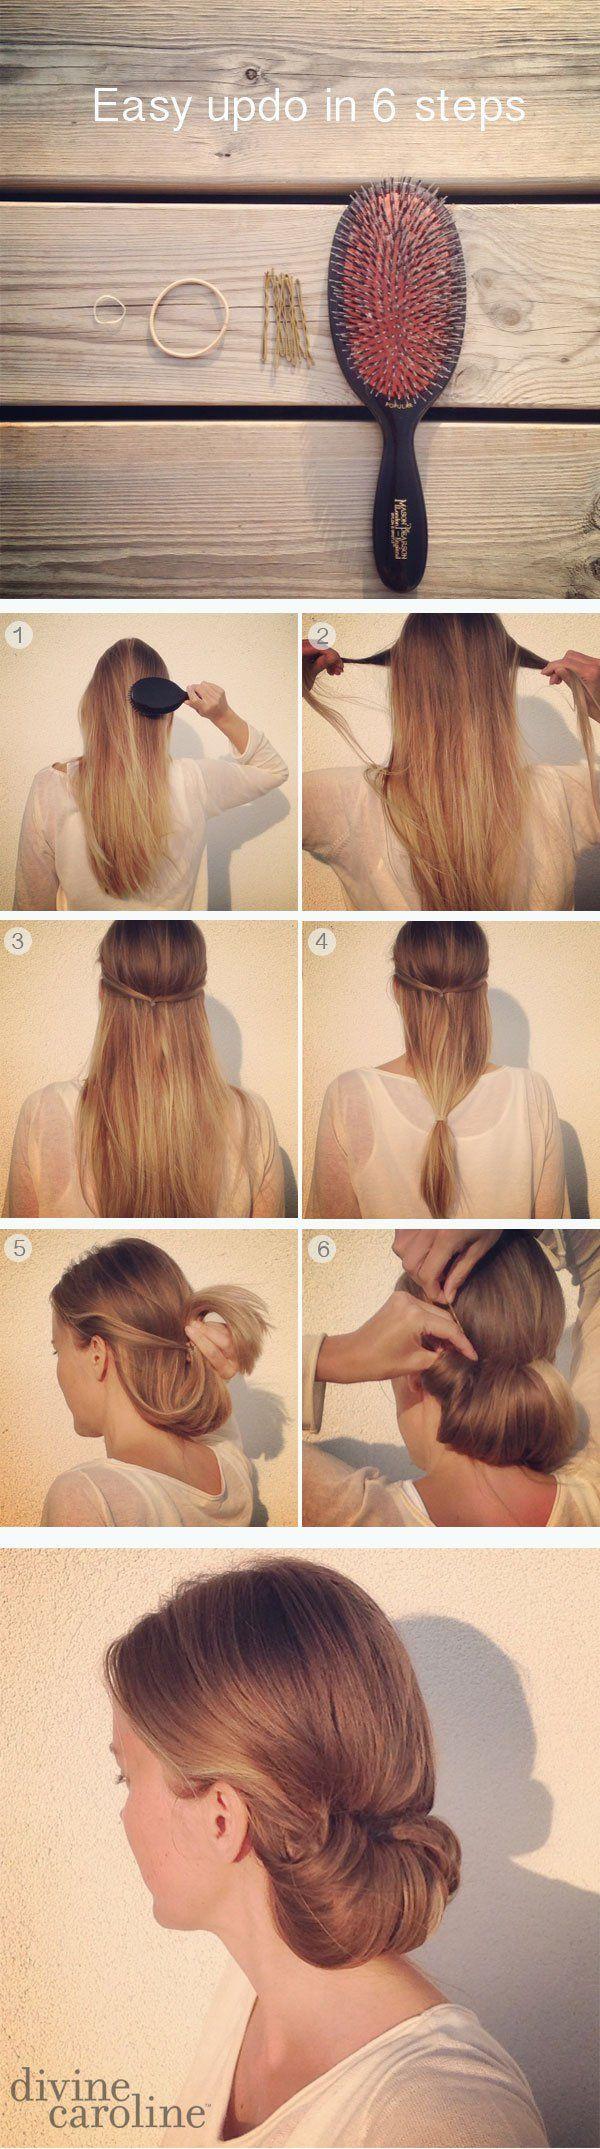 Astonishing 1000 Ideas About Quick Easy Updo On Pinterest Easy Updo Updo Short Hairstyles Gunalazisus